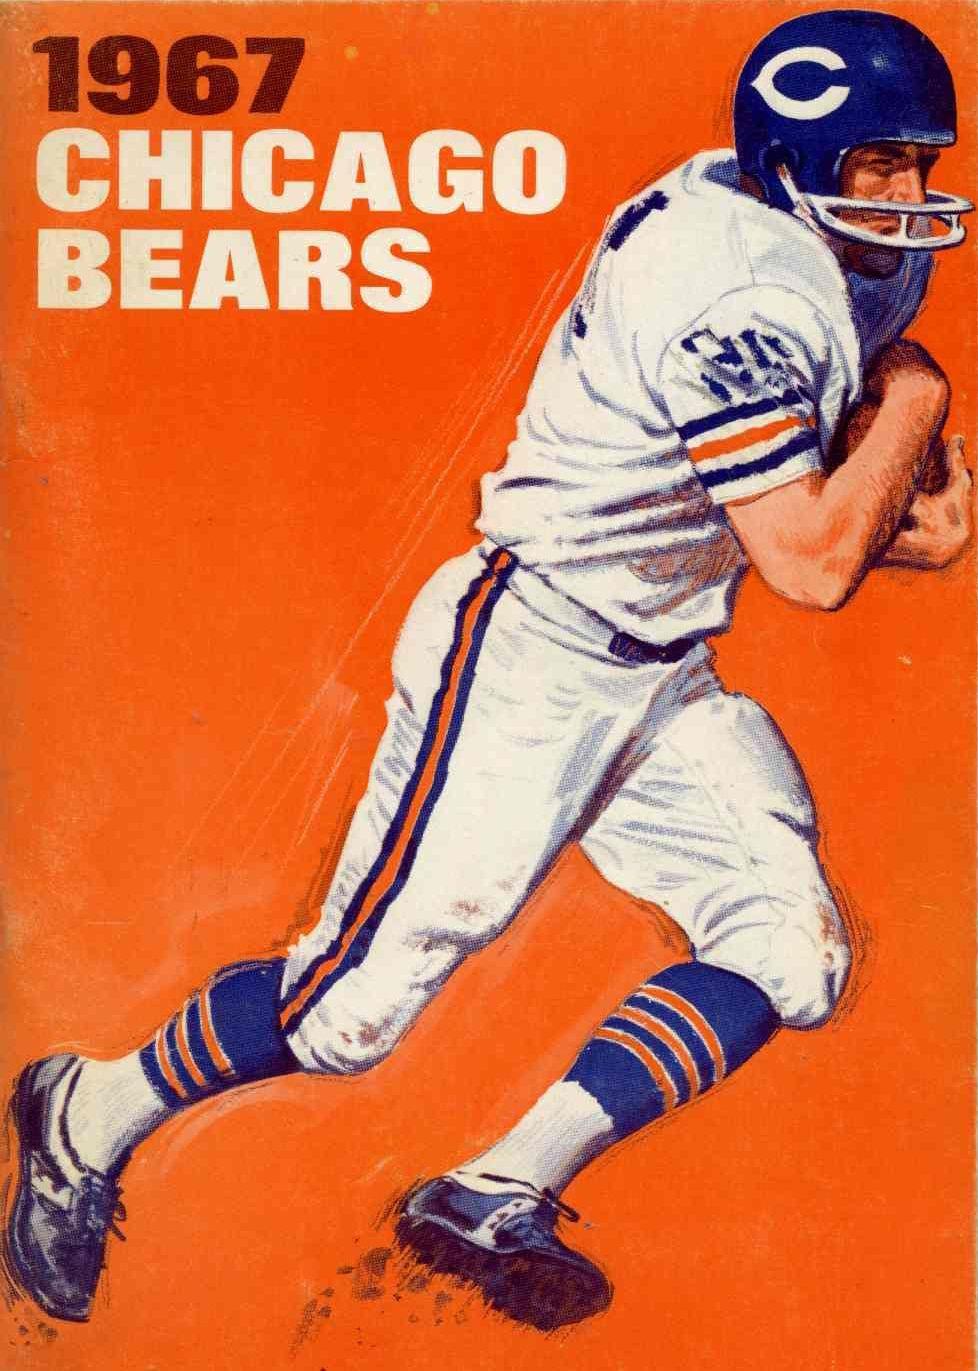 1967 Chicago Bears Nfl chicago bears, Chicago bears